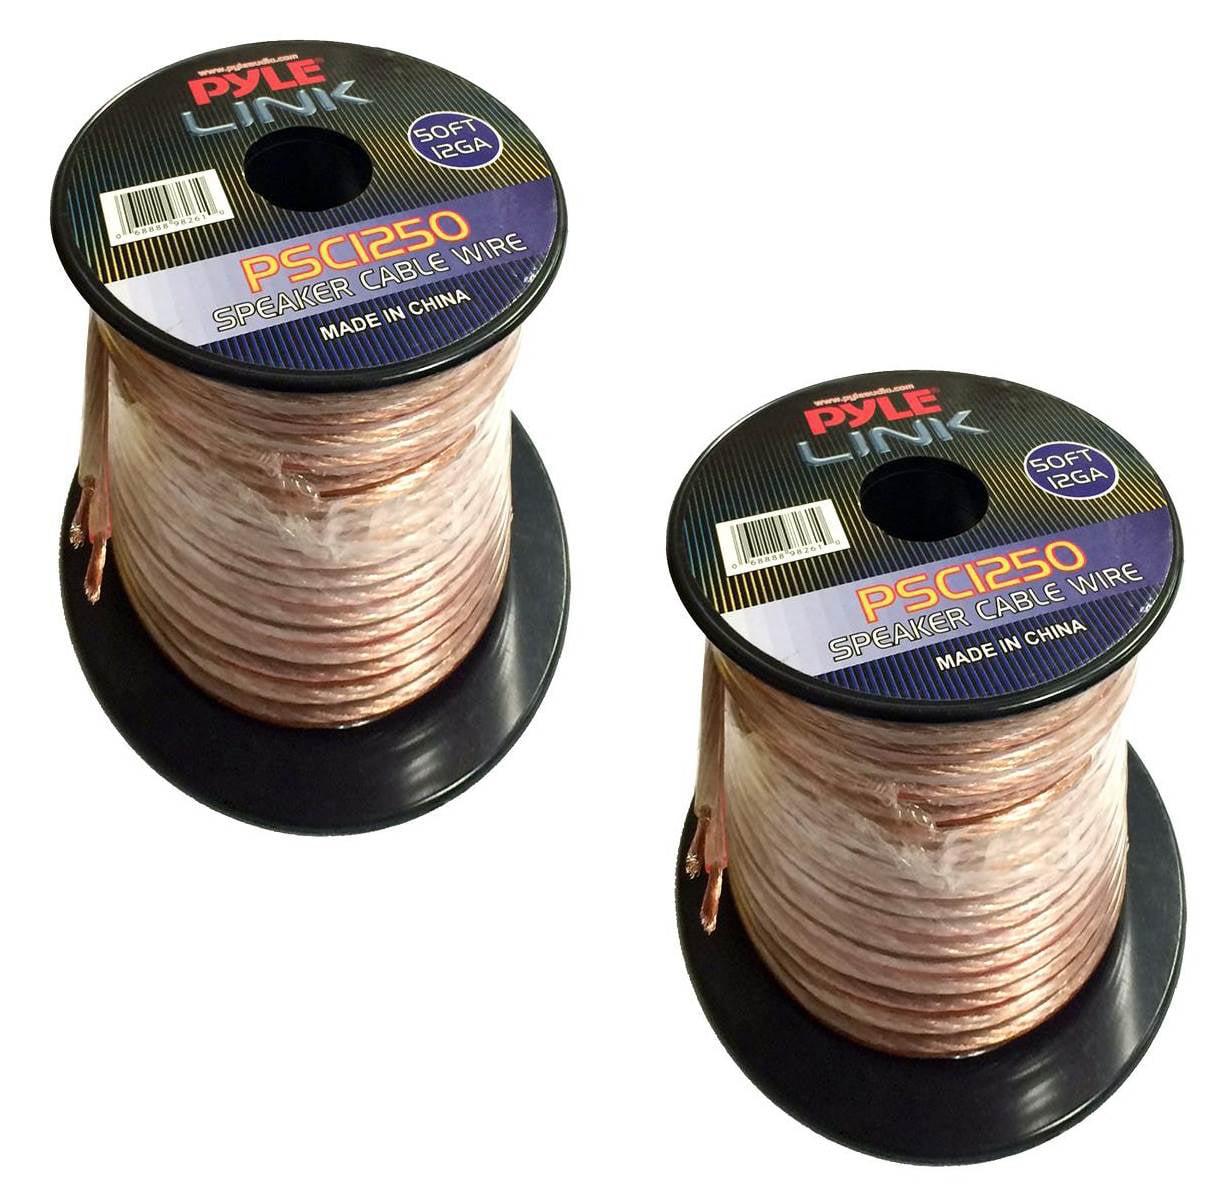 Spool of High Quality Speaker Zip Wire Pyle PSC1250 12 Gauge 50 ft